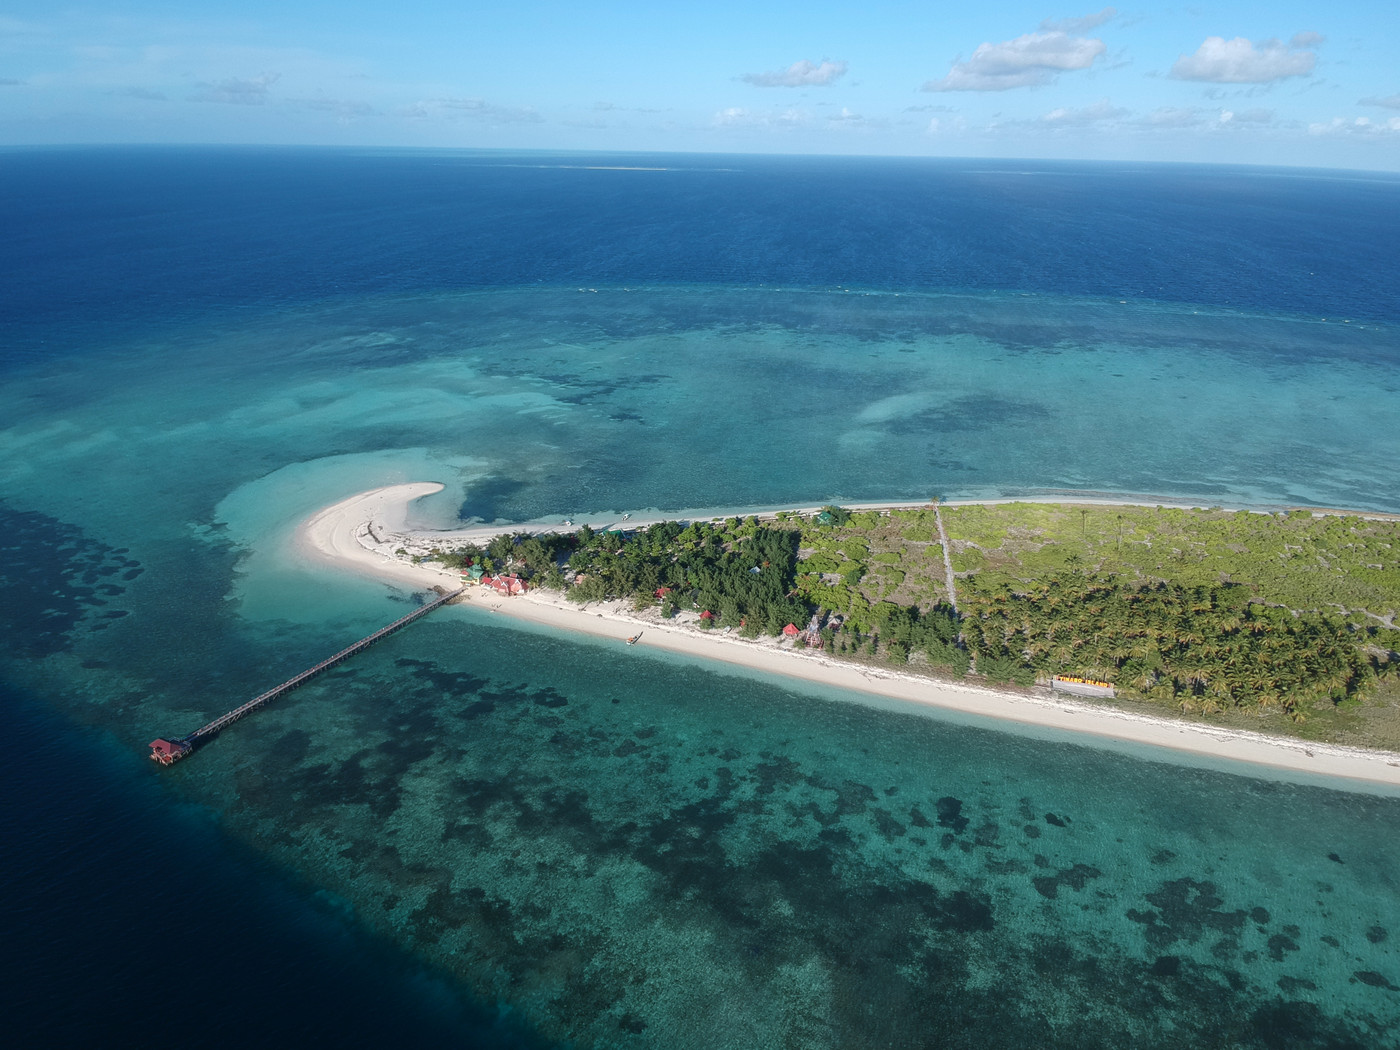 takabonerate national park in selayar island